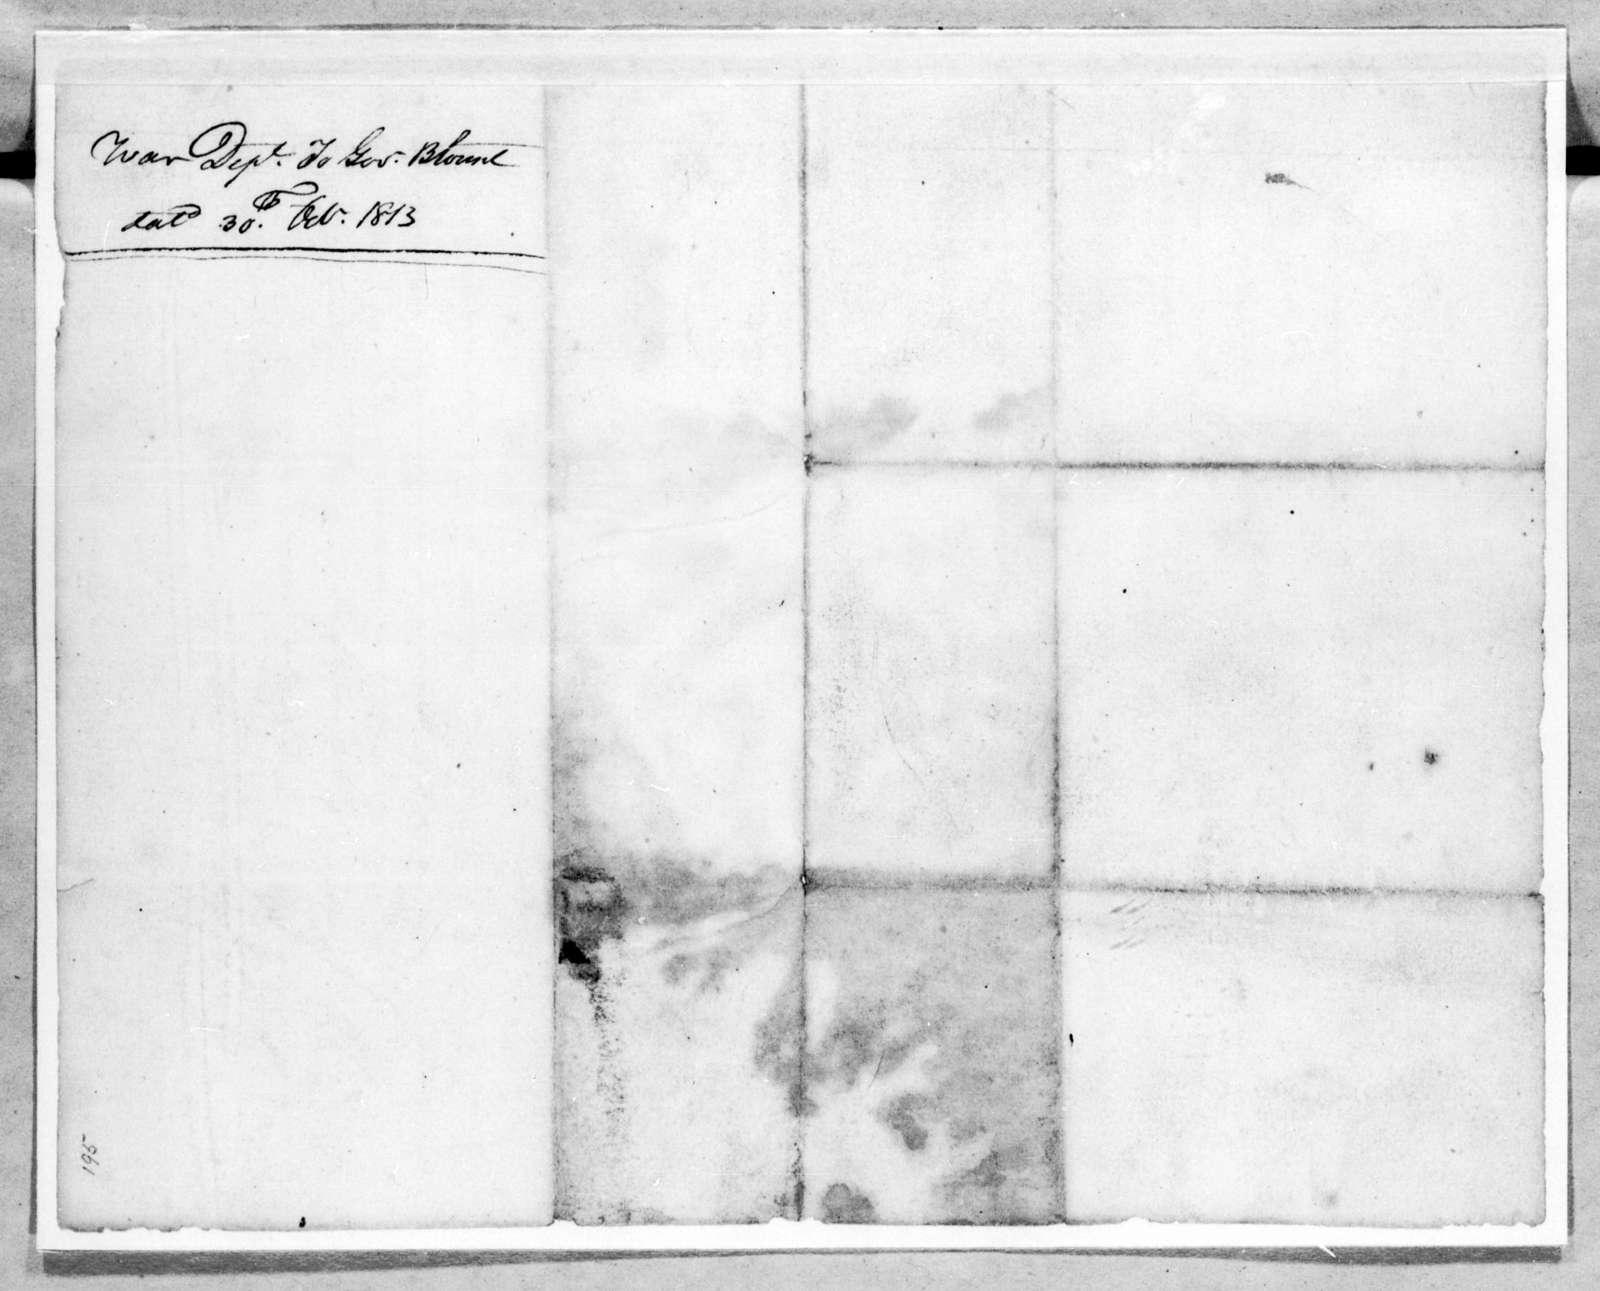 Daniel Parker to Willie Blount, October 30, 1813